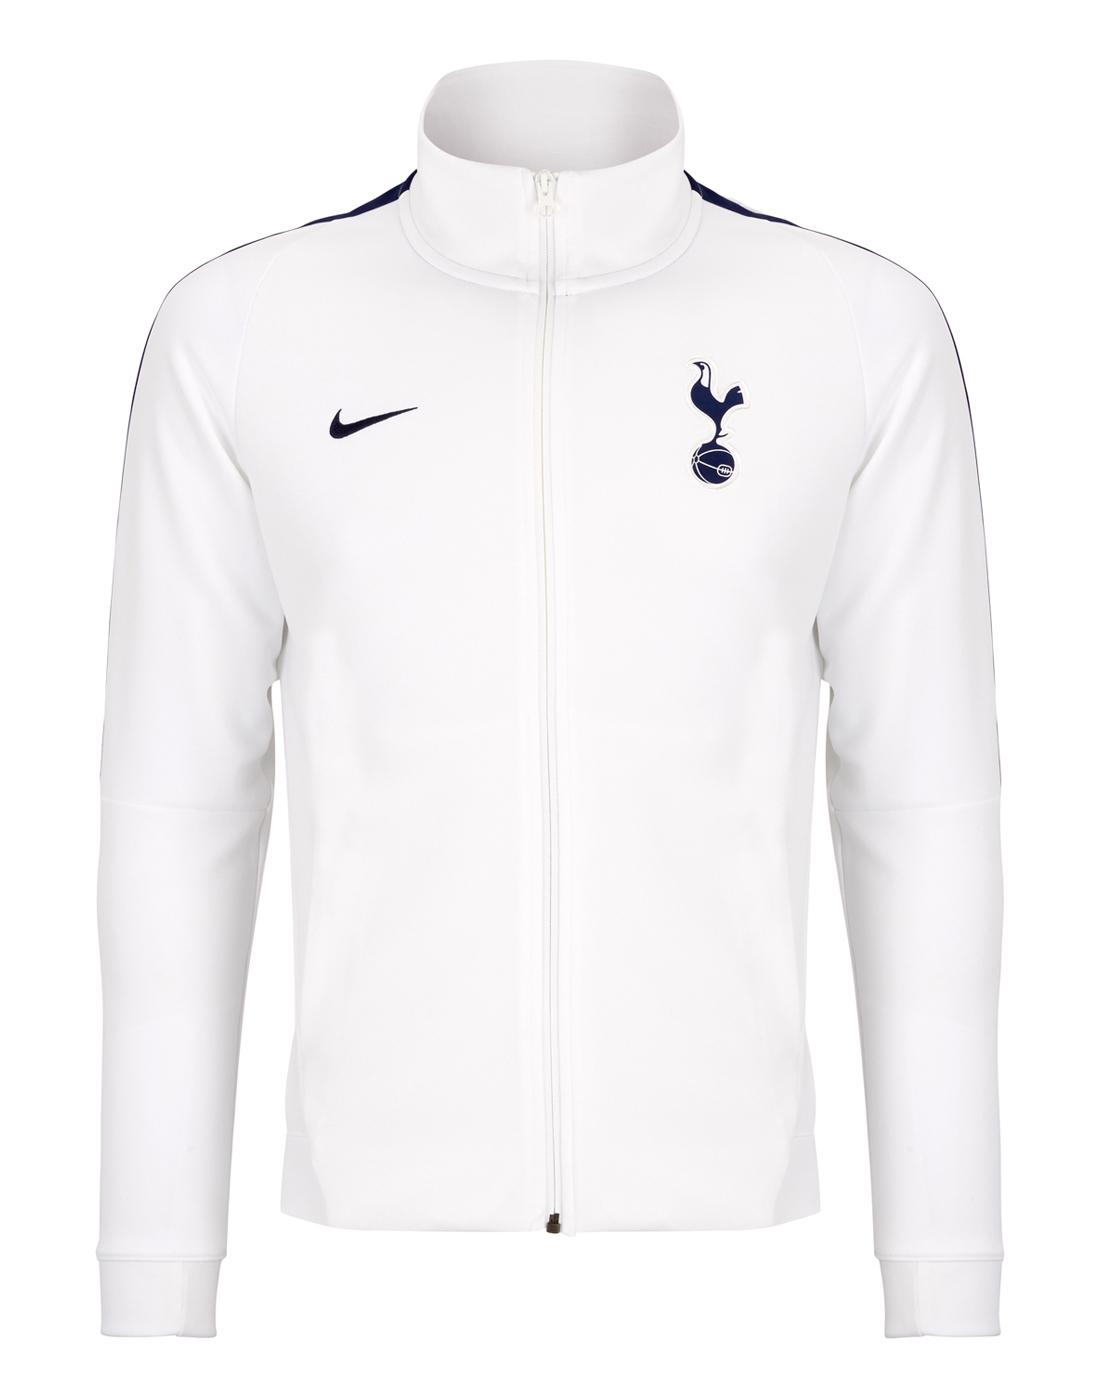 6cdb04d7d9 Nike Adult Spurs 17 18 N98 Jacket